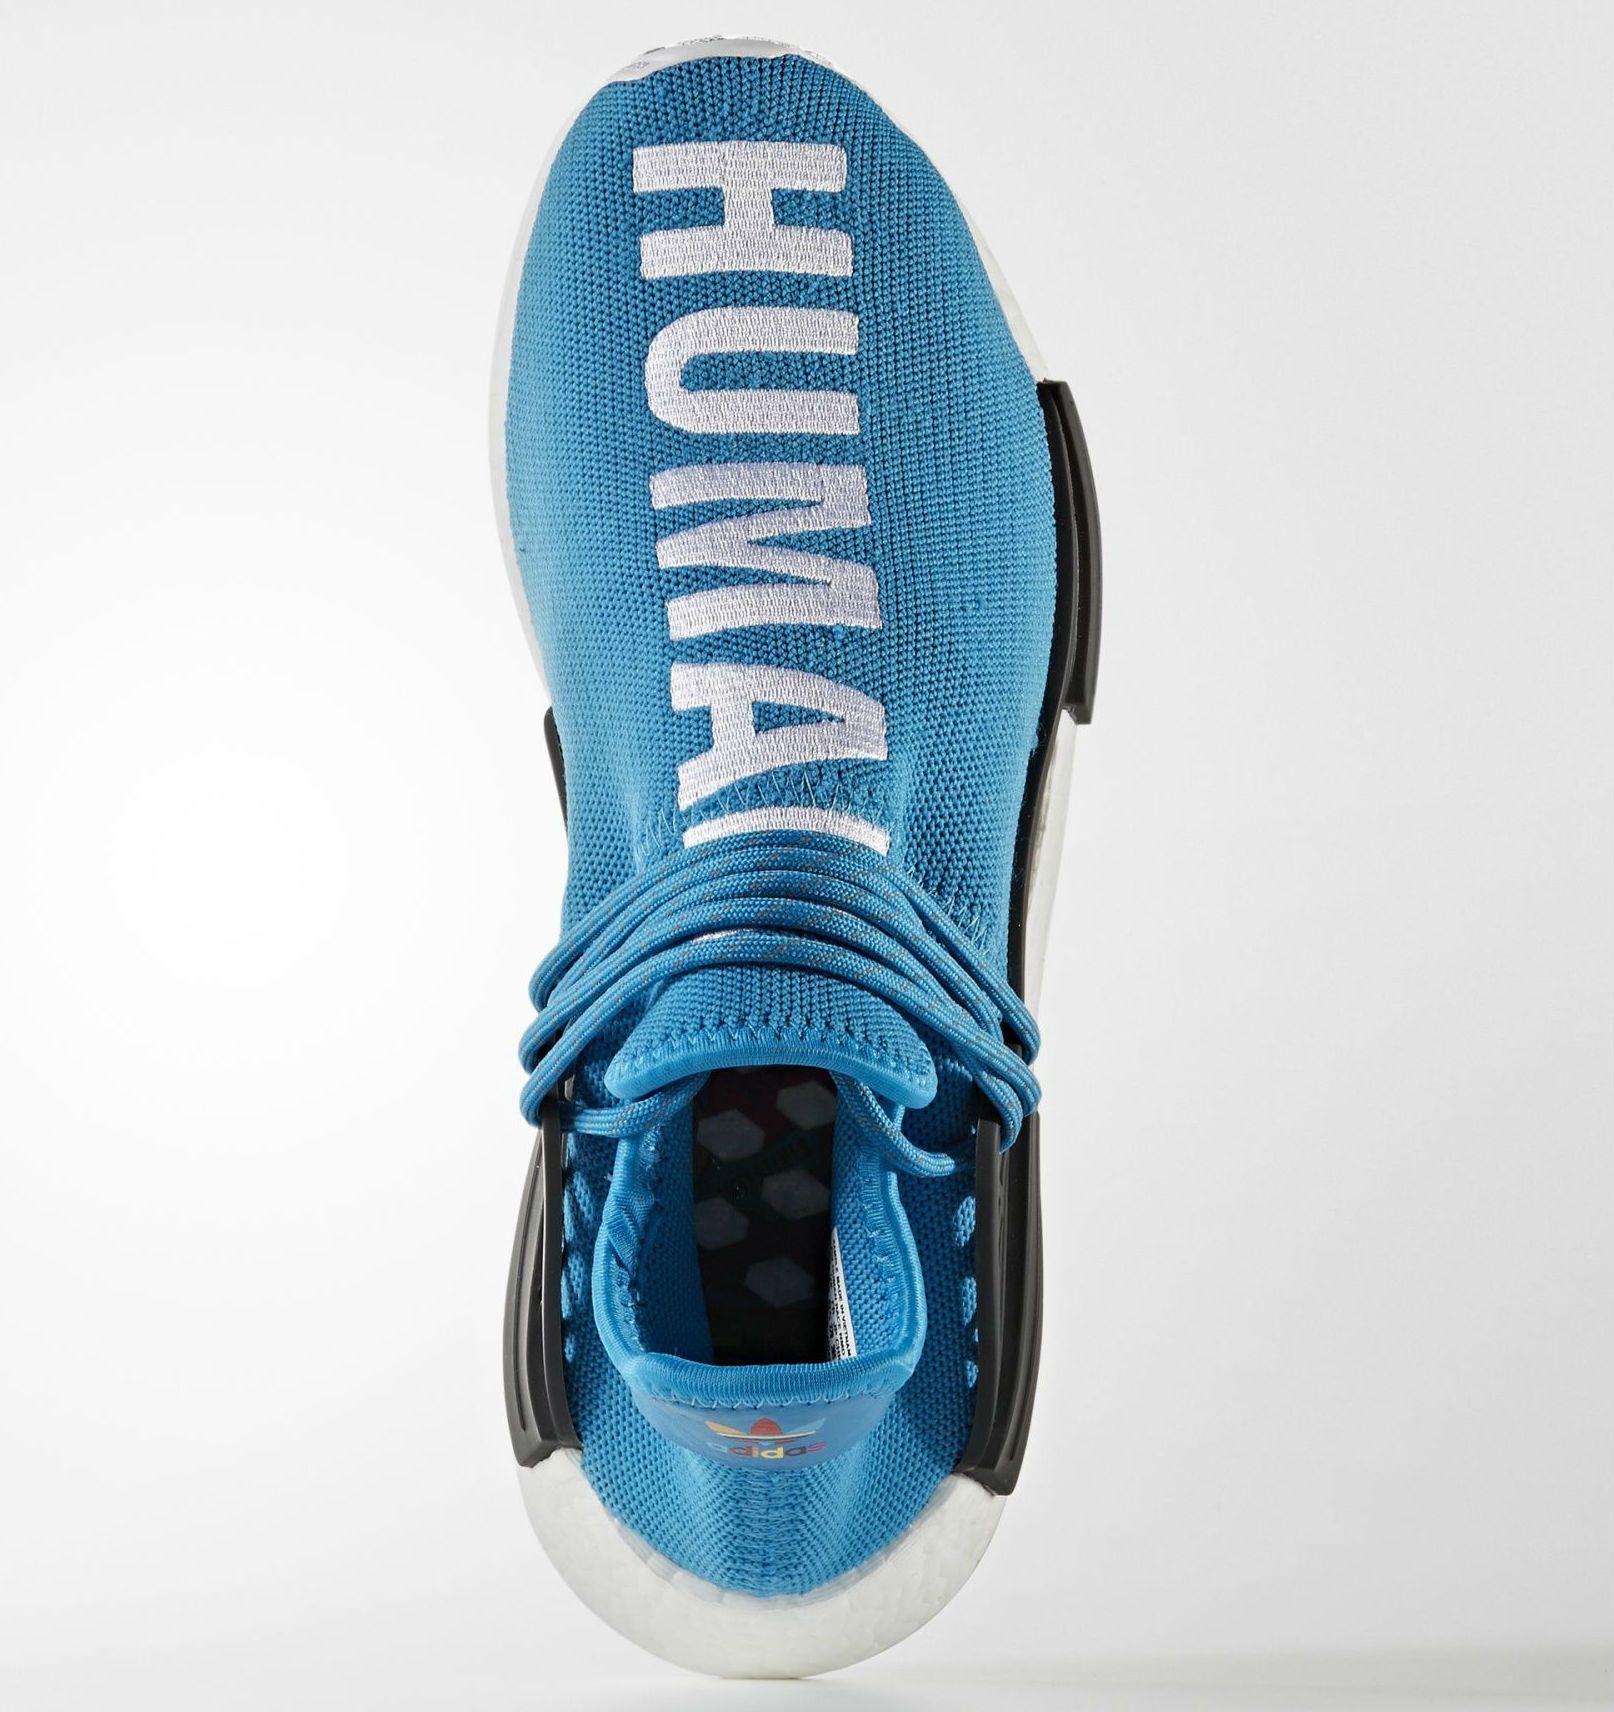 Azul Pharrell Adidas NMD raza humana Top frnts Pinterest adidas